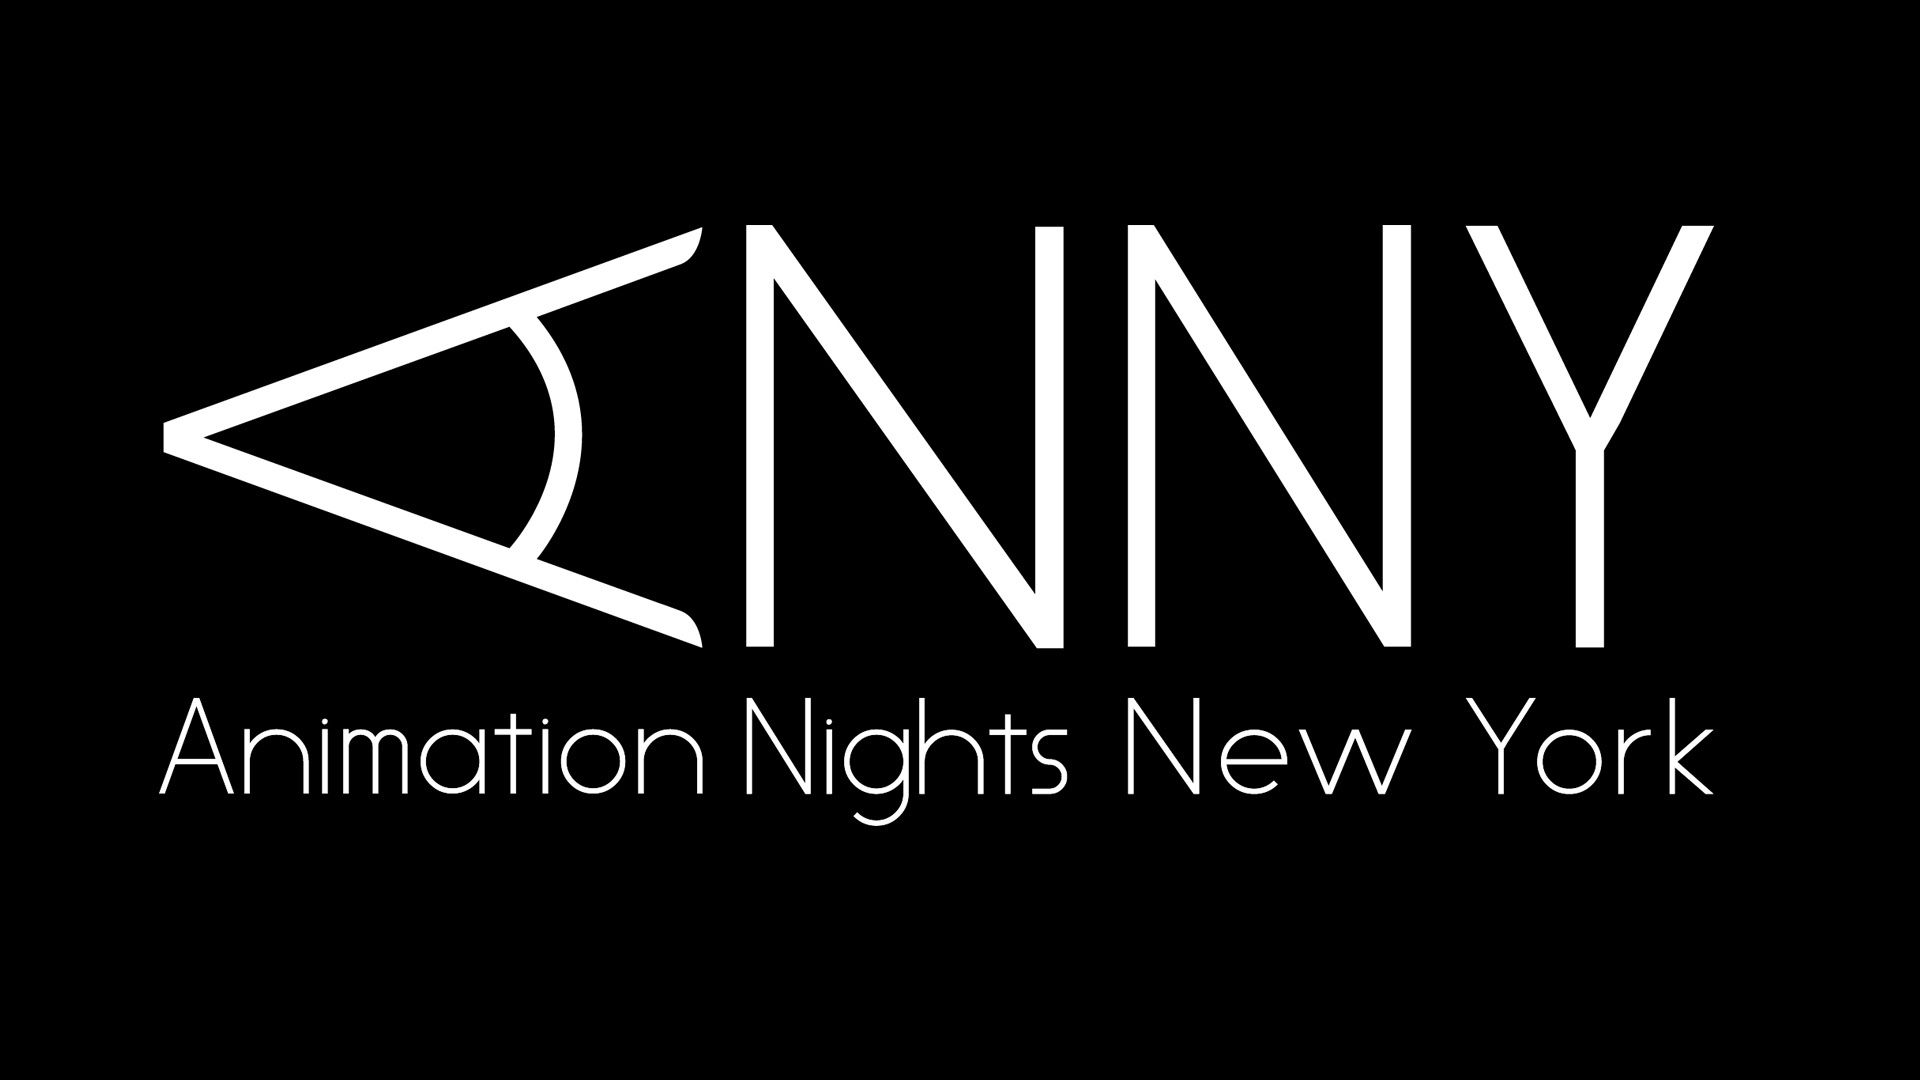 Animation Nights New York